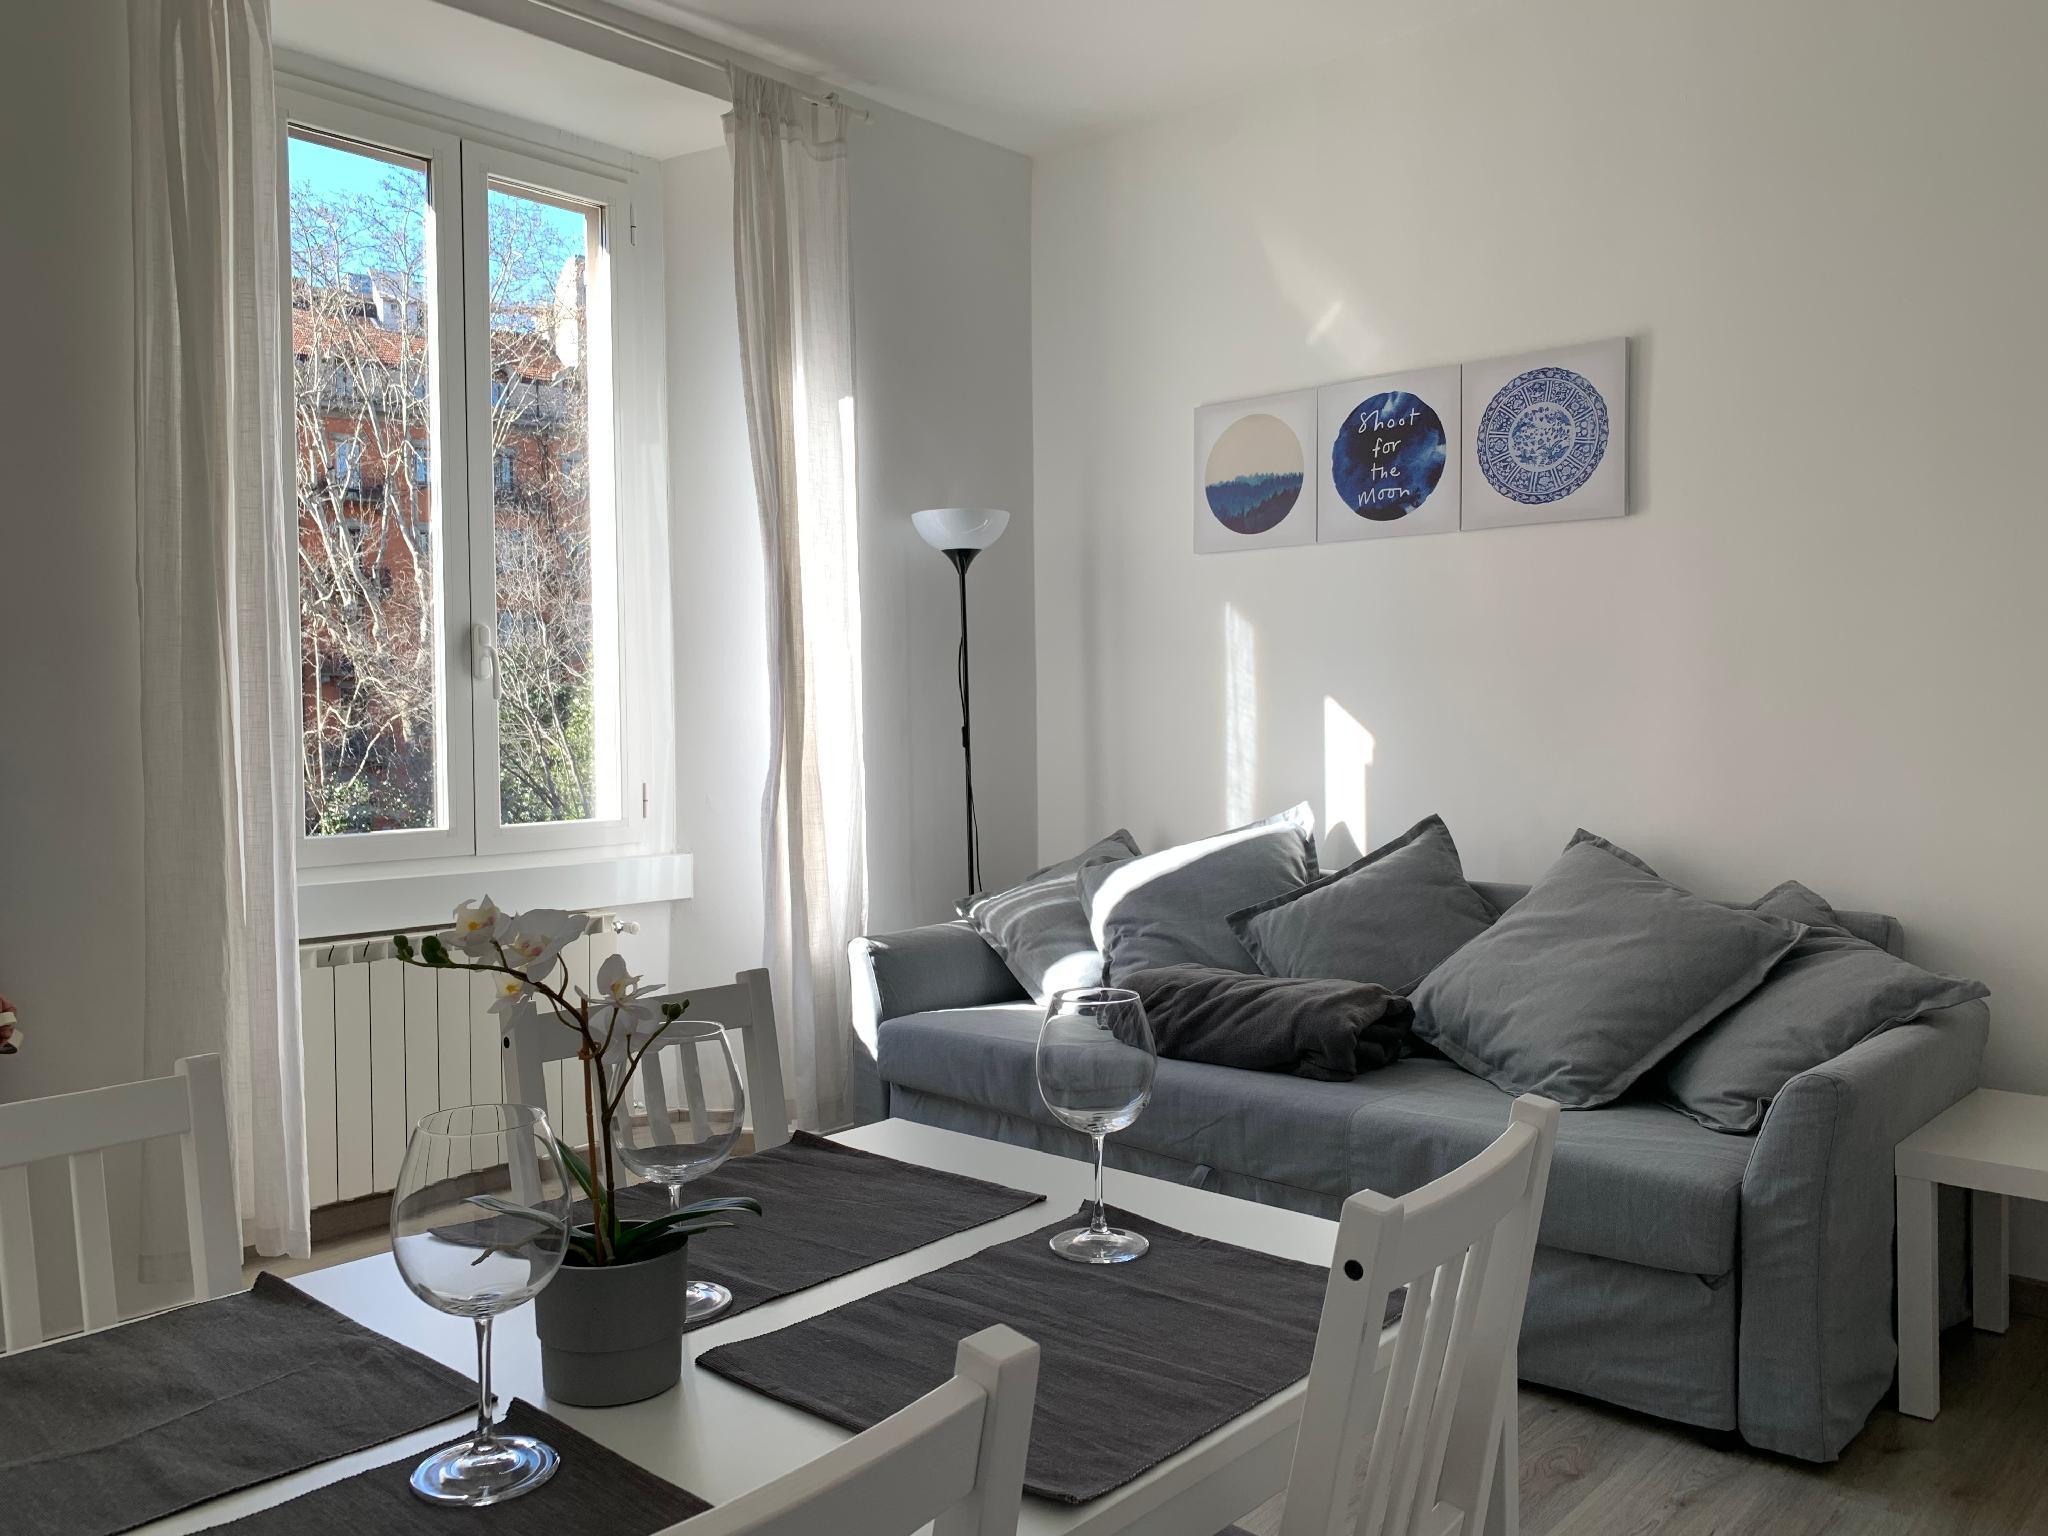 Exclusive apartment in the heart of Porta Venezia